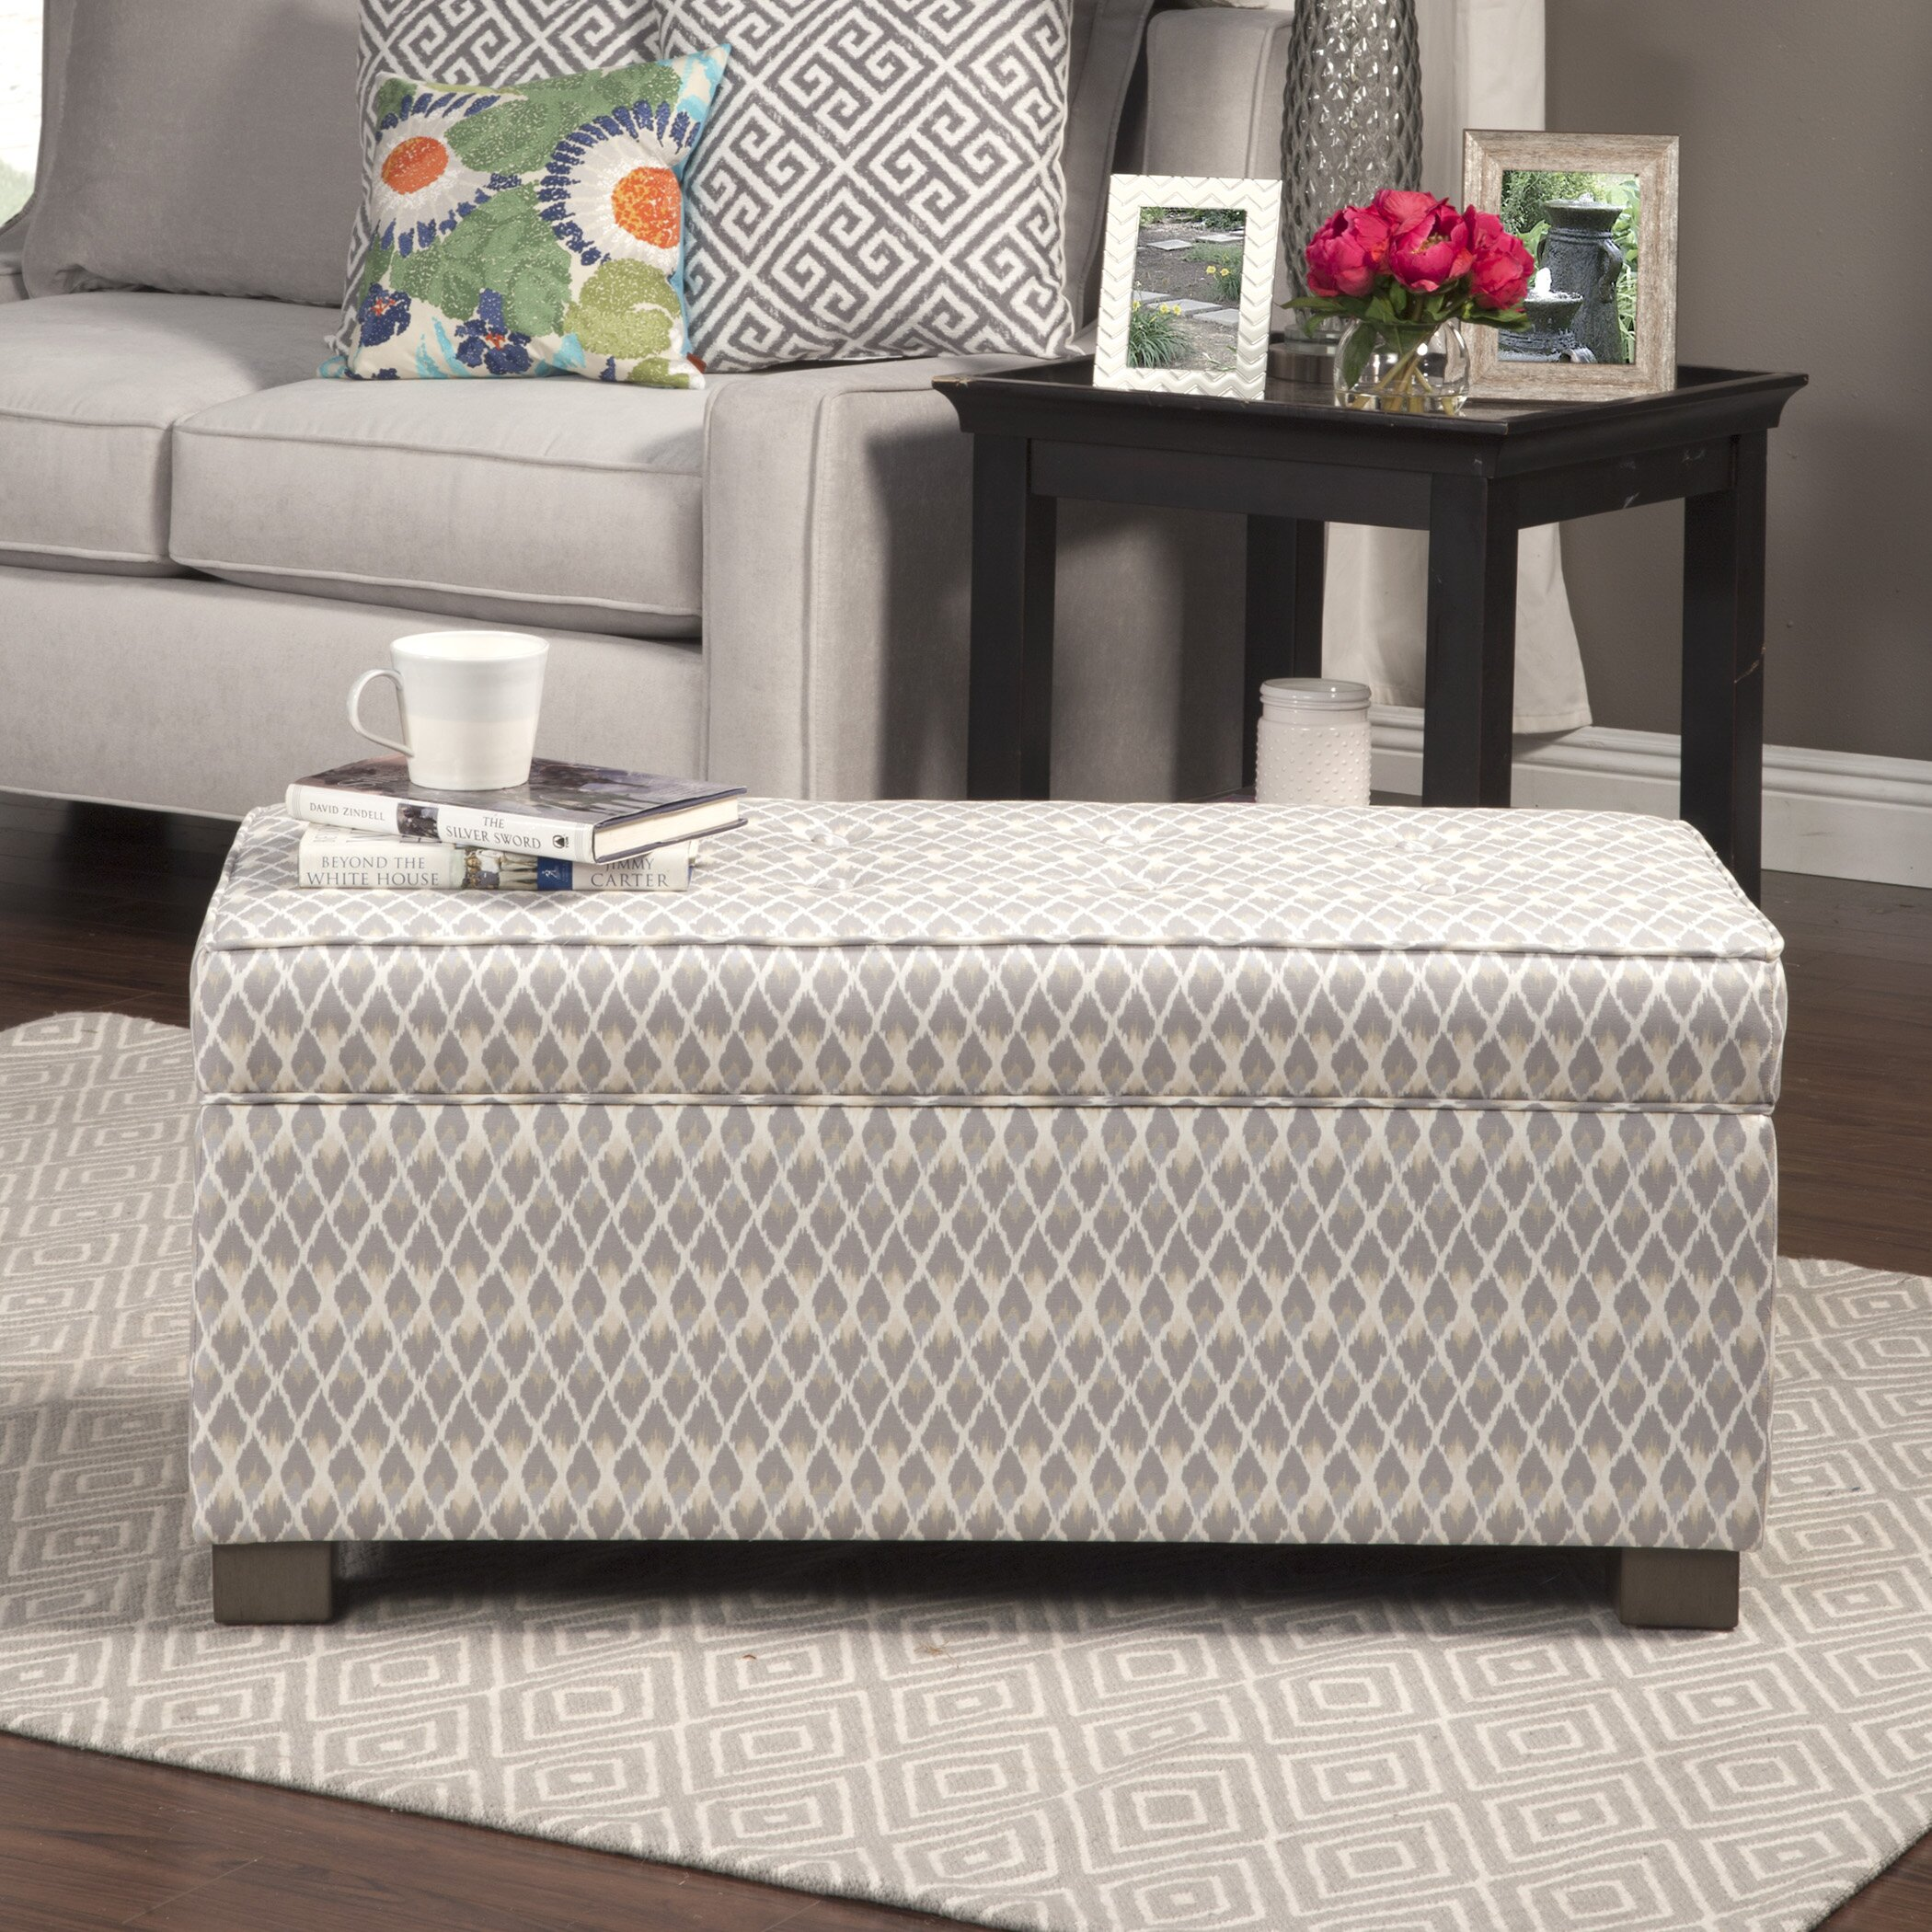 Bungalow Rose Navya Wood Storage Bedroom Bench Reviews: Bungalow Rose Mumtaz Upholstered Decorative Storage